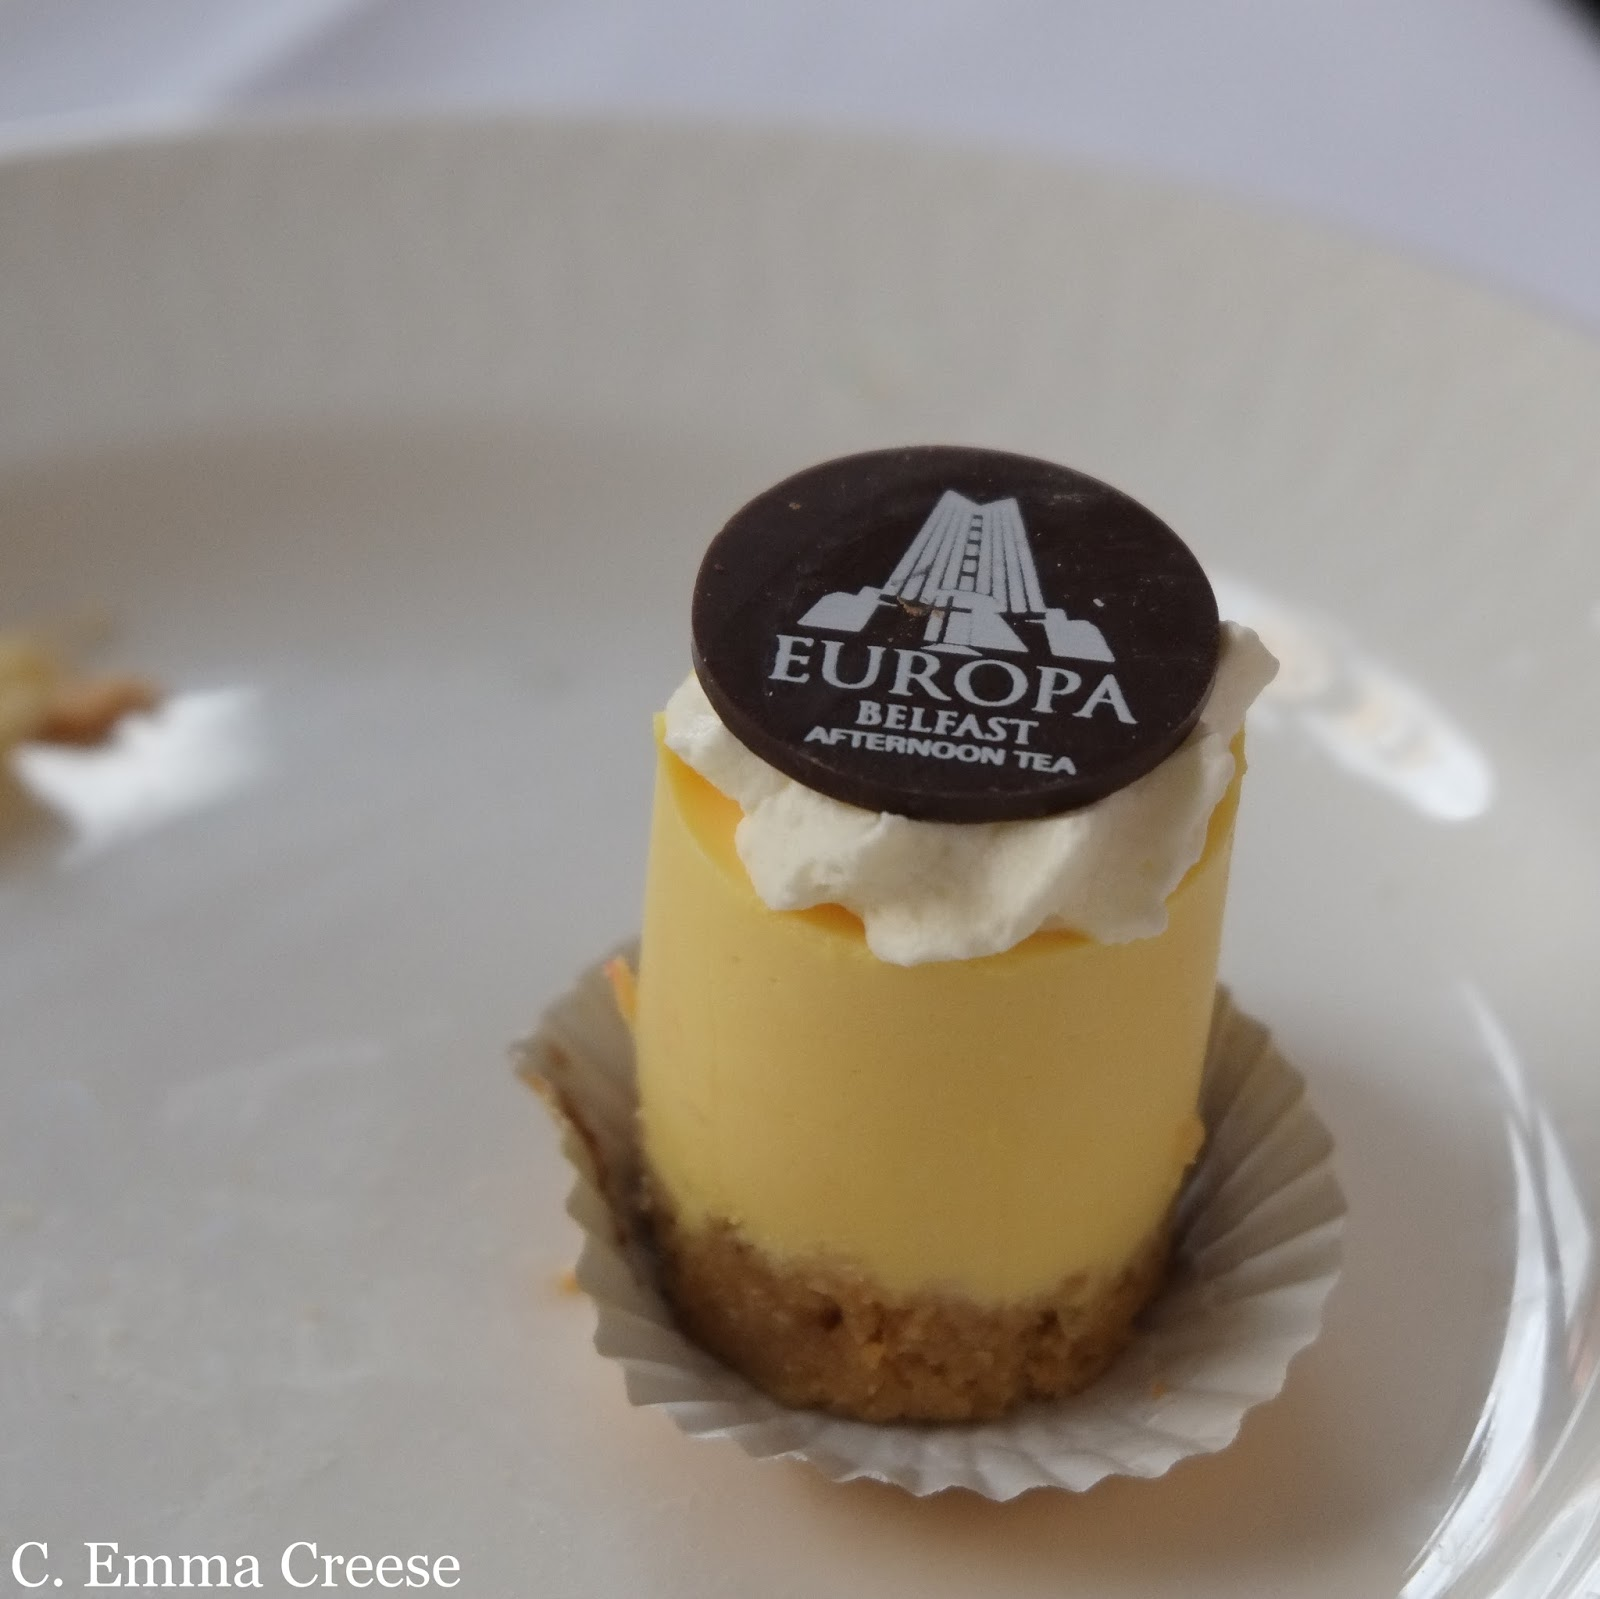 Europa Hotel Belfast Afternoon Tea Adventures of a London Kiwi